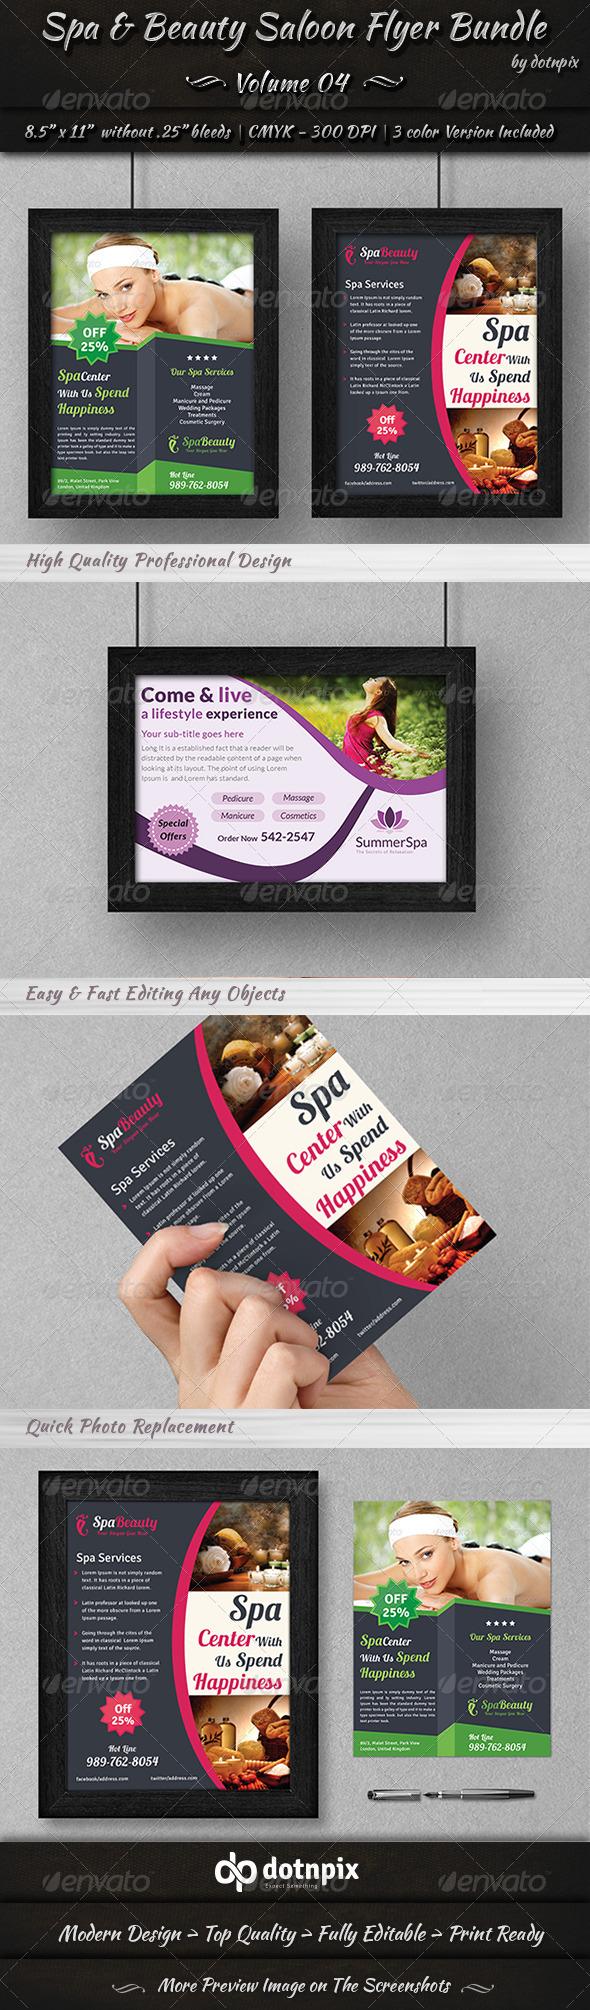 Spa & Beauty Saloon Flyer Bundle | Volume 4 - Corporate Flyers